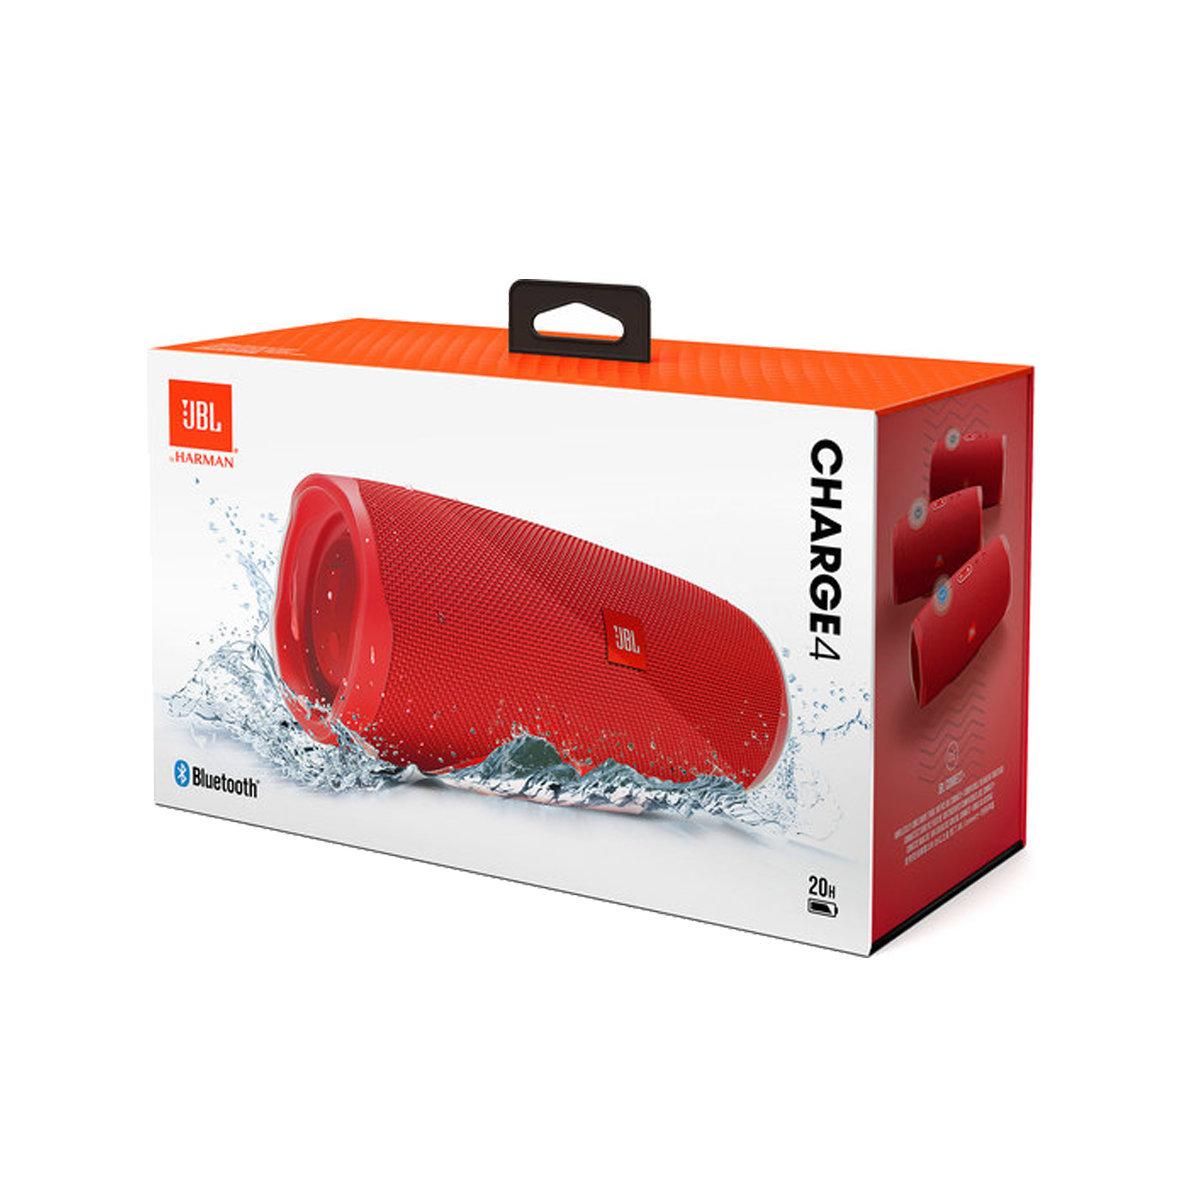 Charge 4 無線藍牙防水喇叭 紅色-平衡進口貨